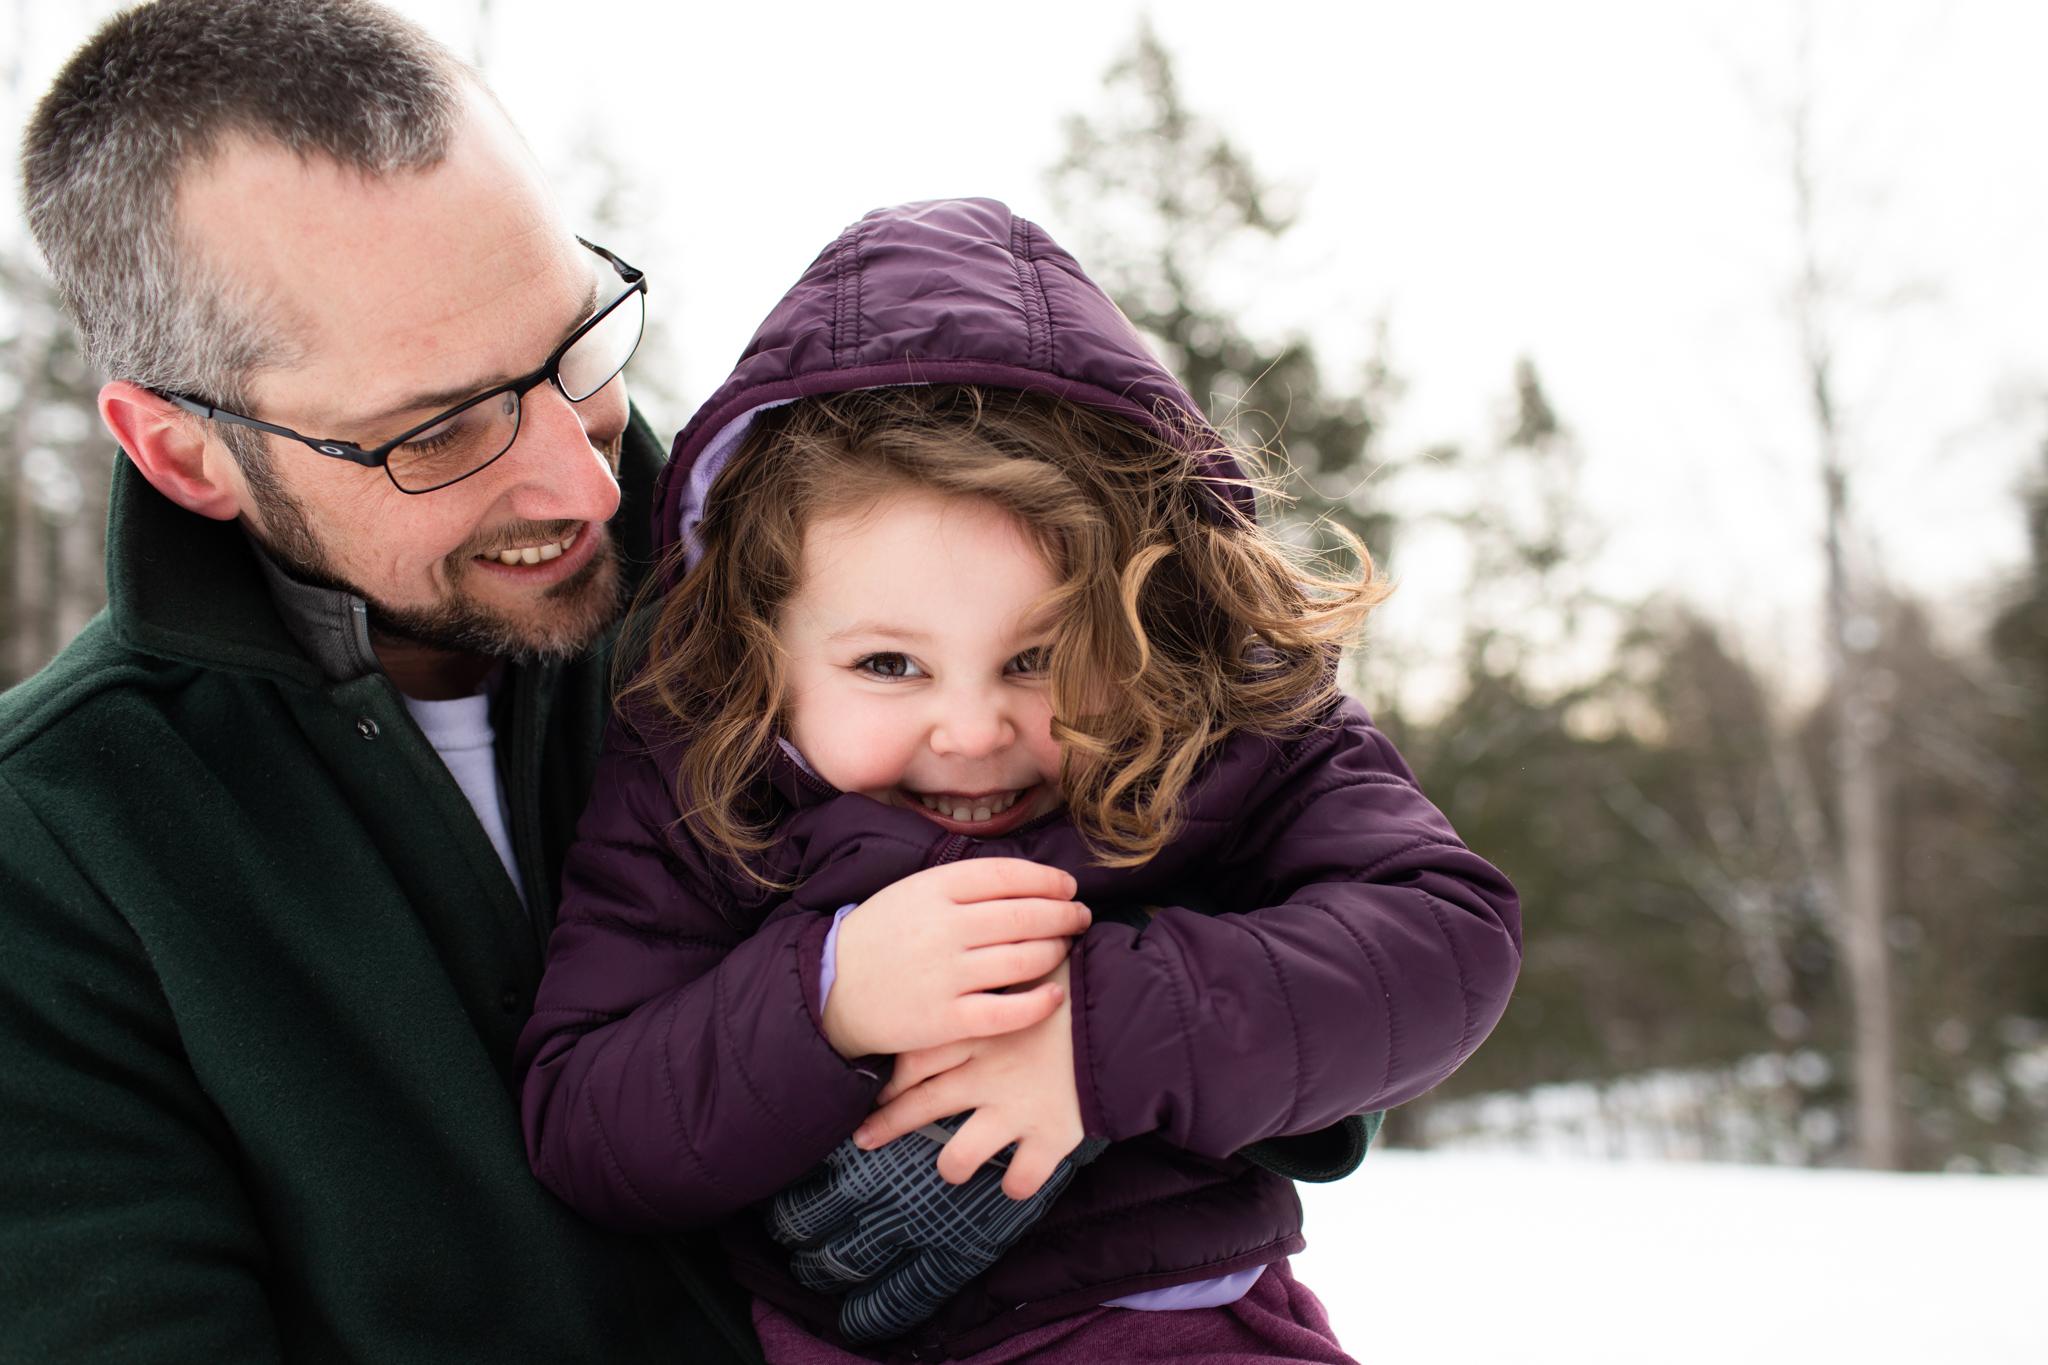 maine-winter-family-photographer-stepheneycollins-23.jpg